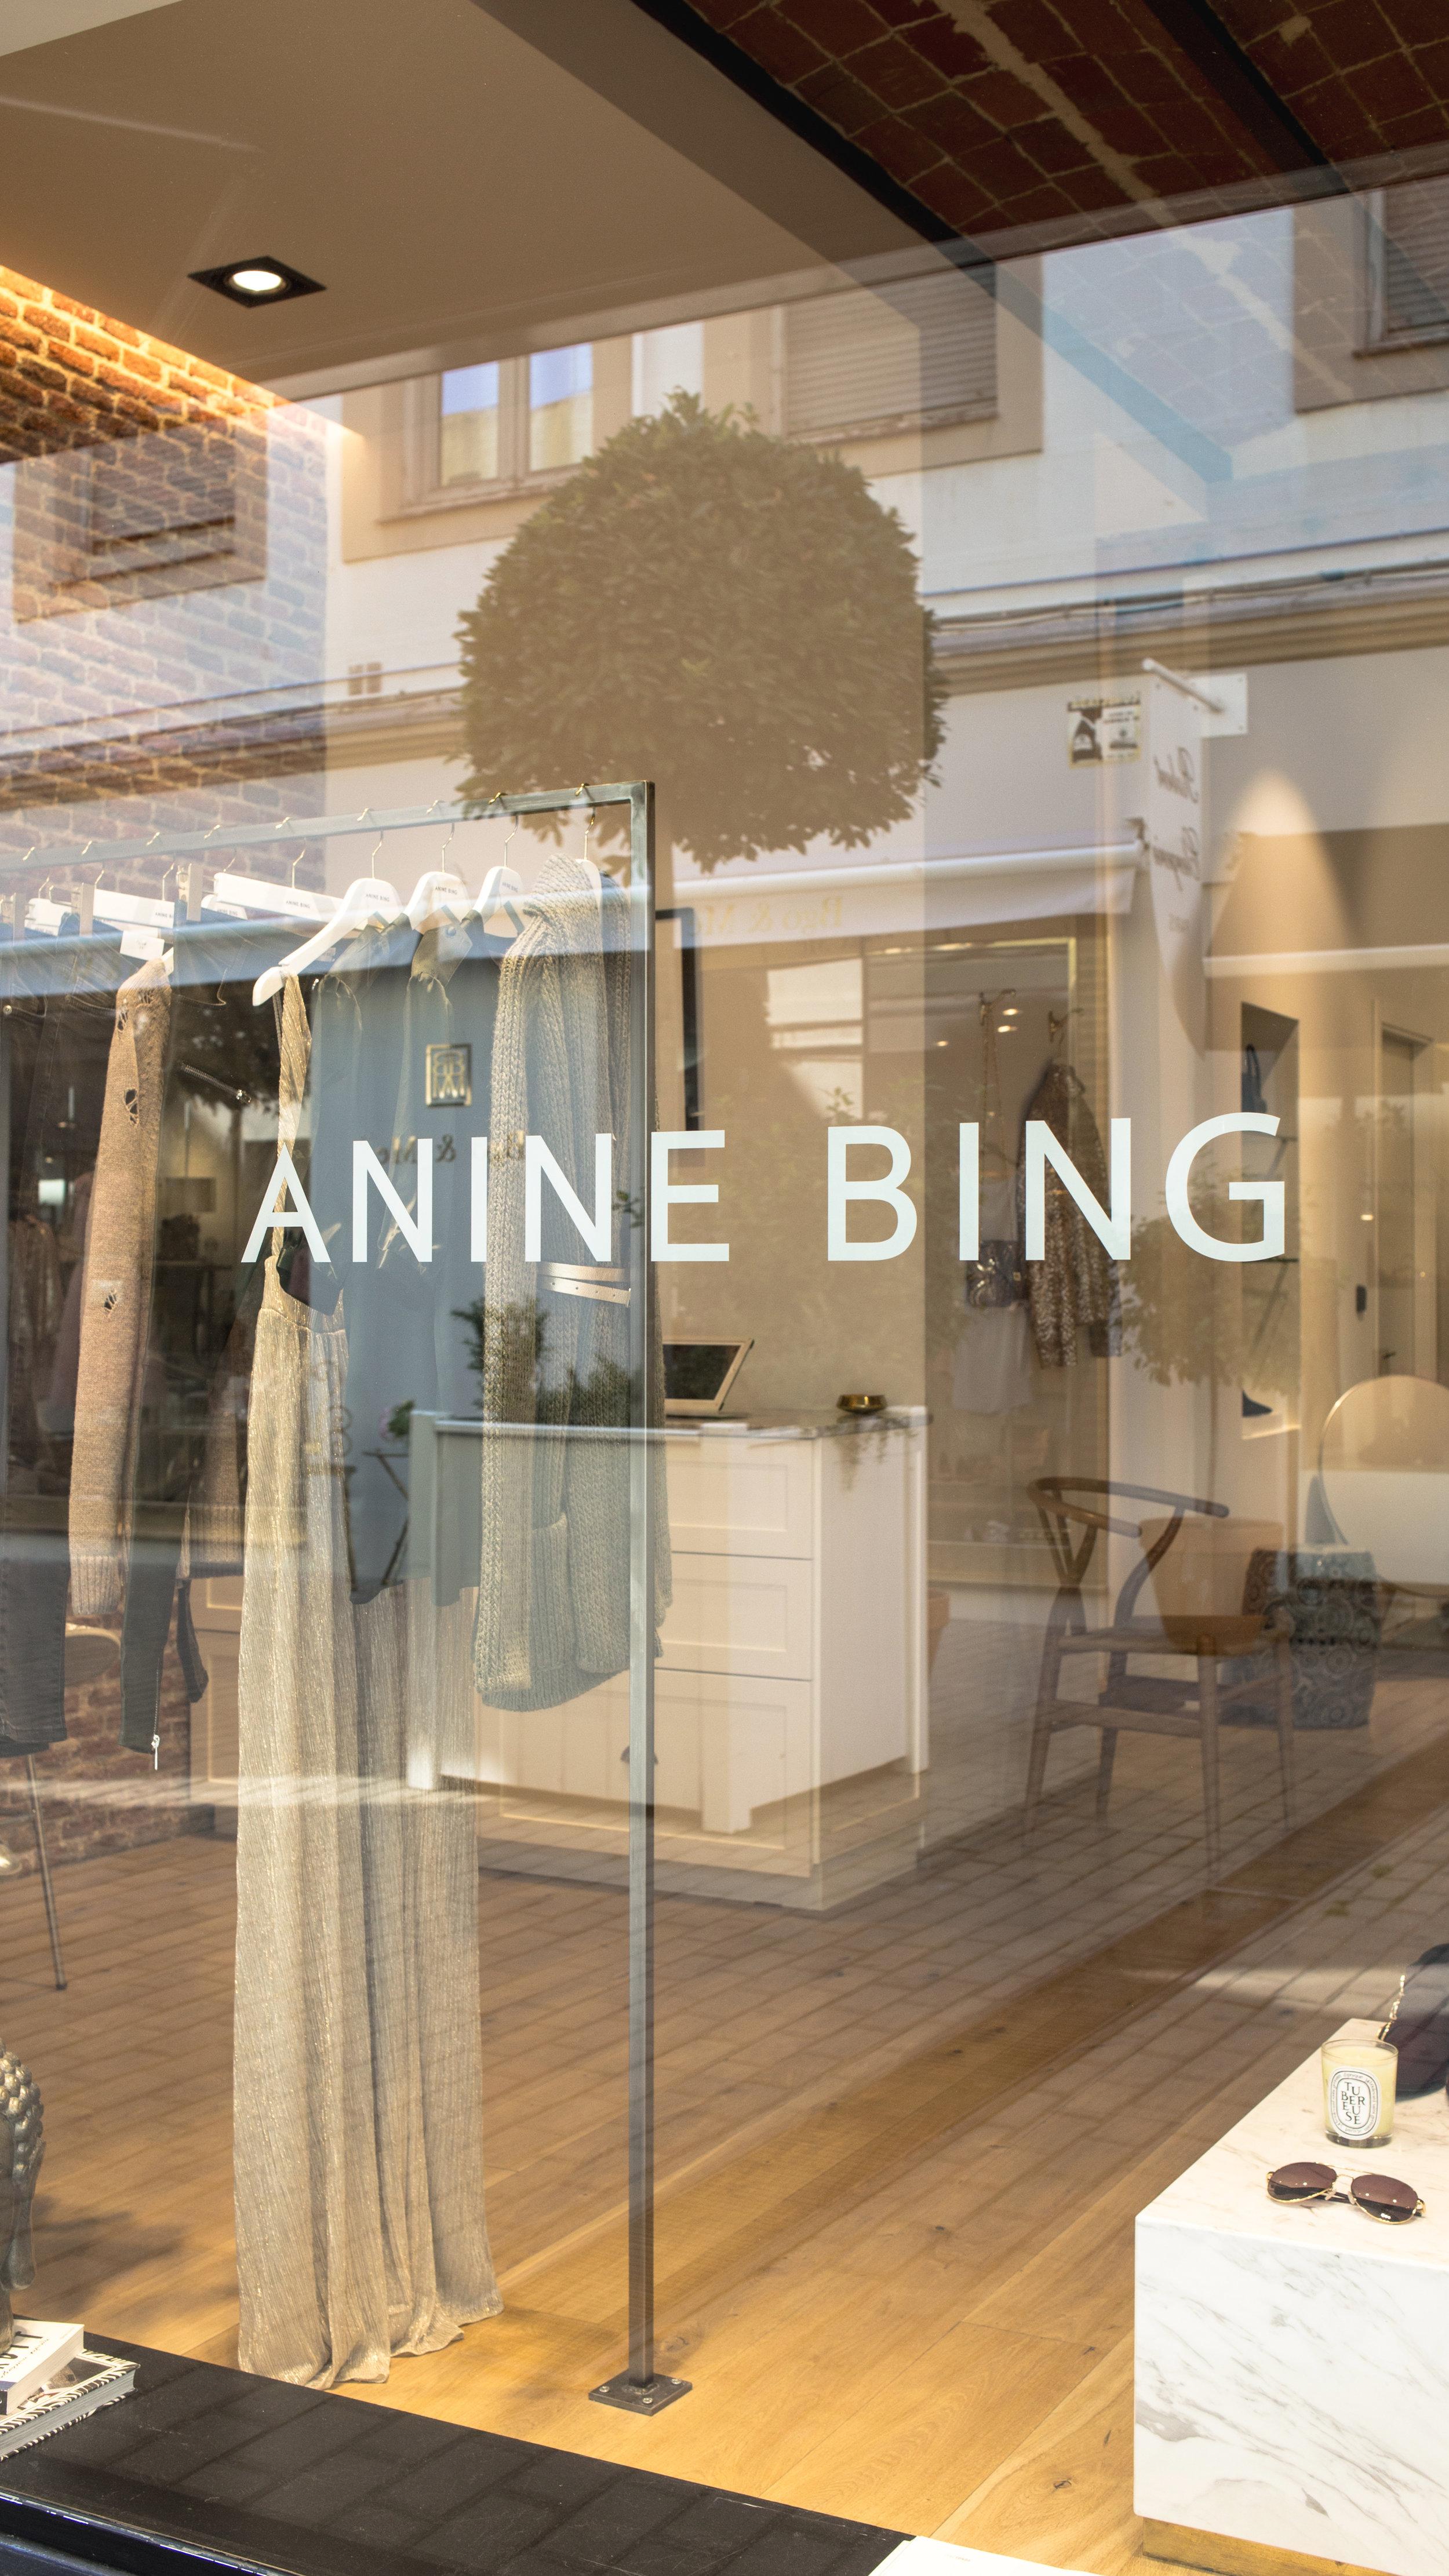 Fachada Anine Bing